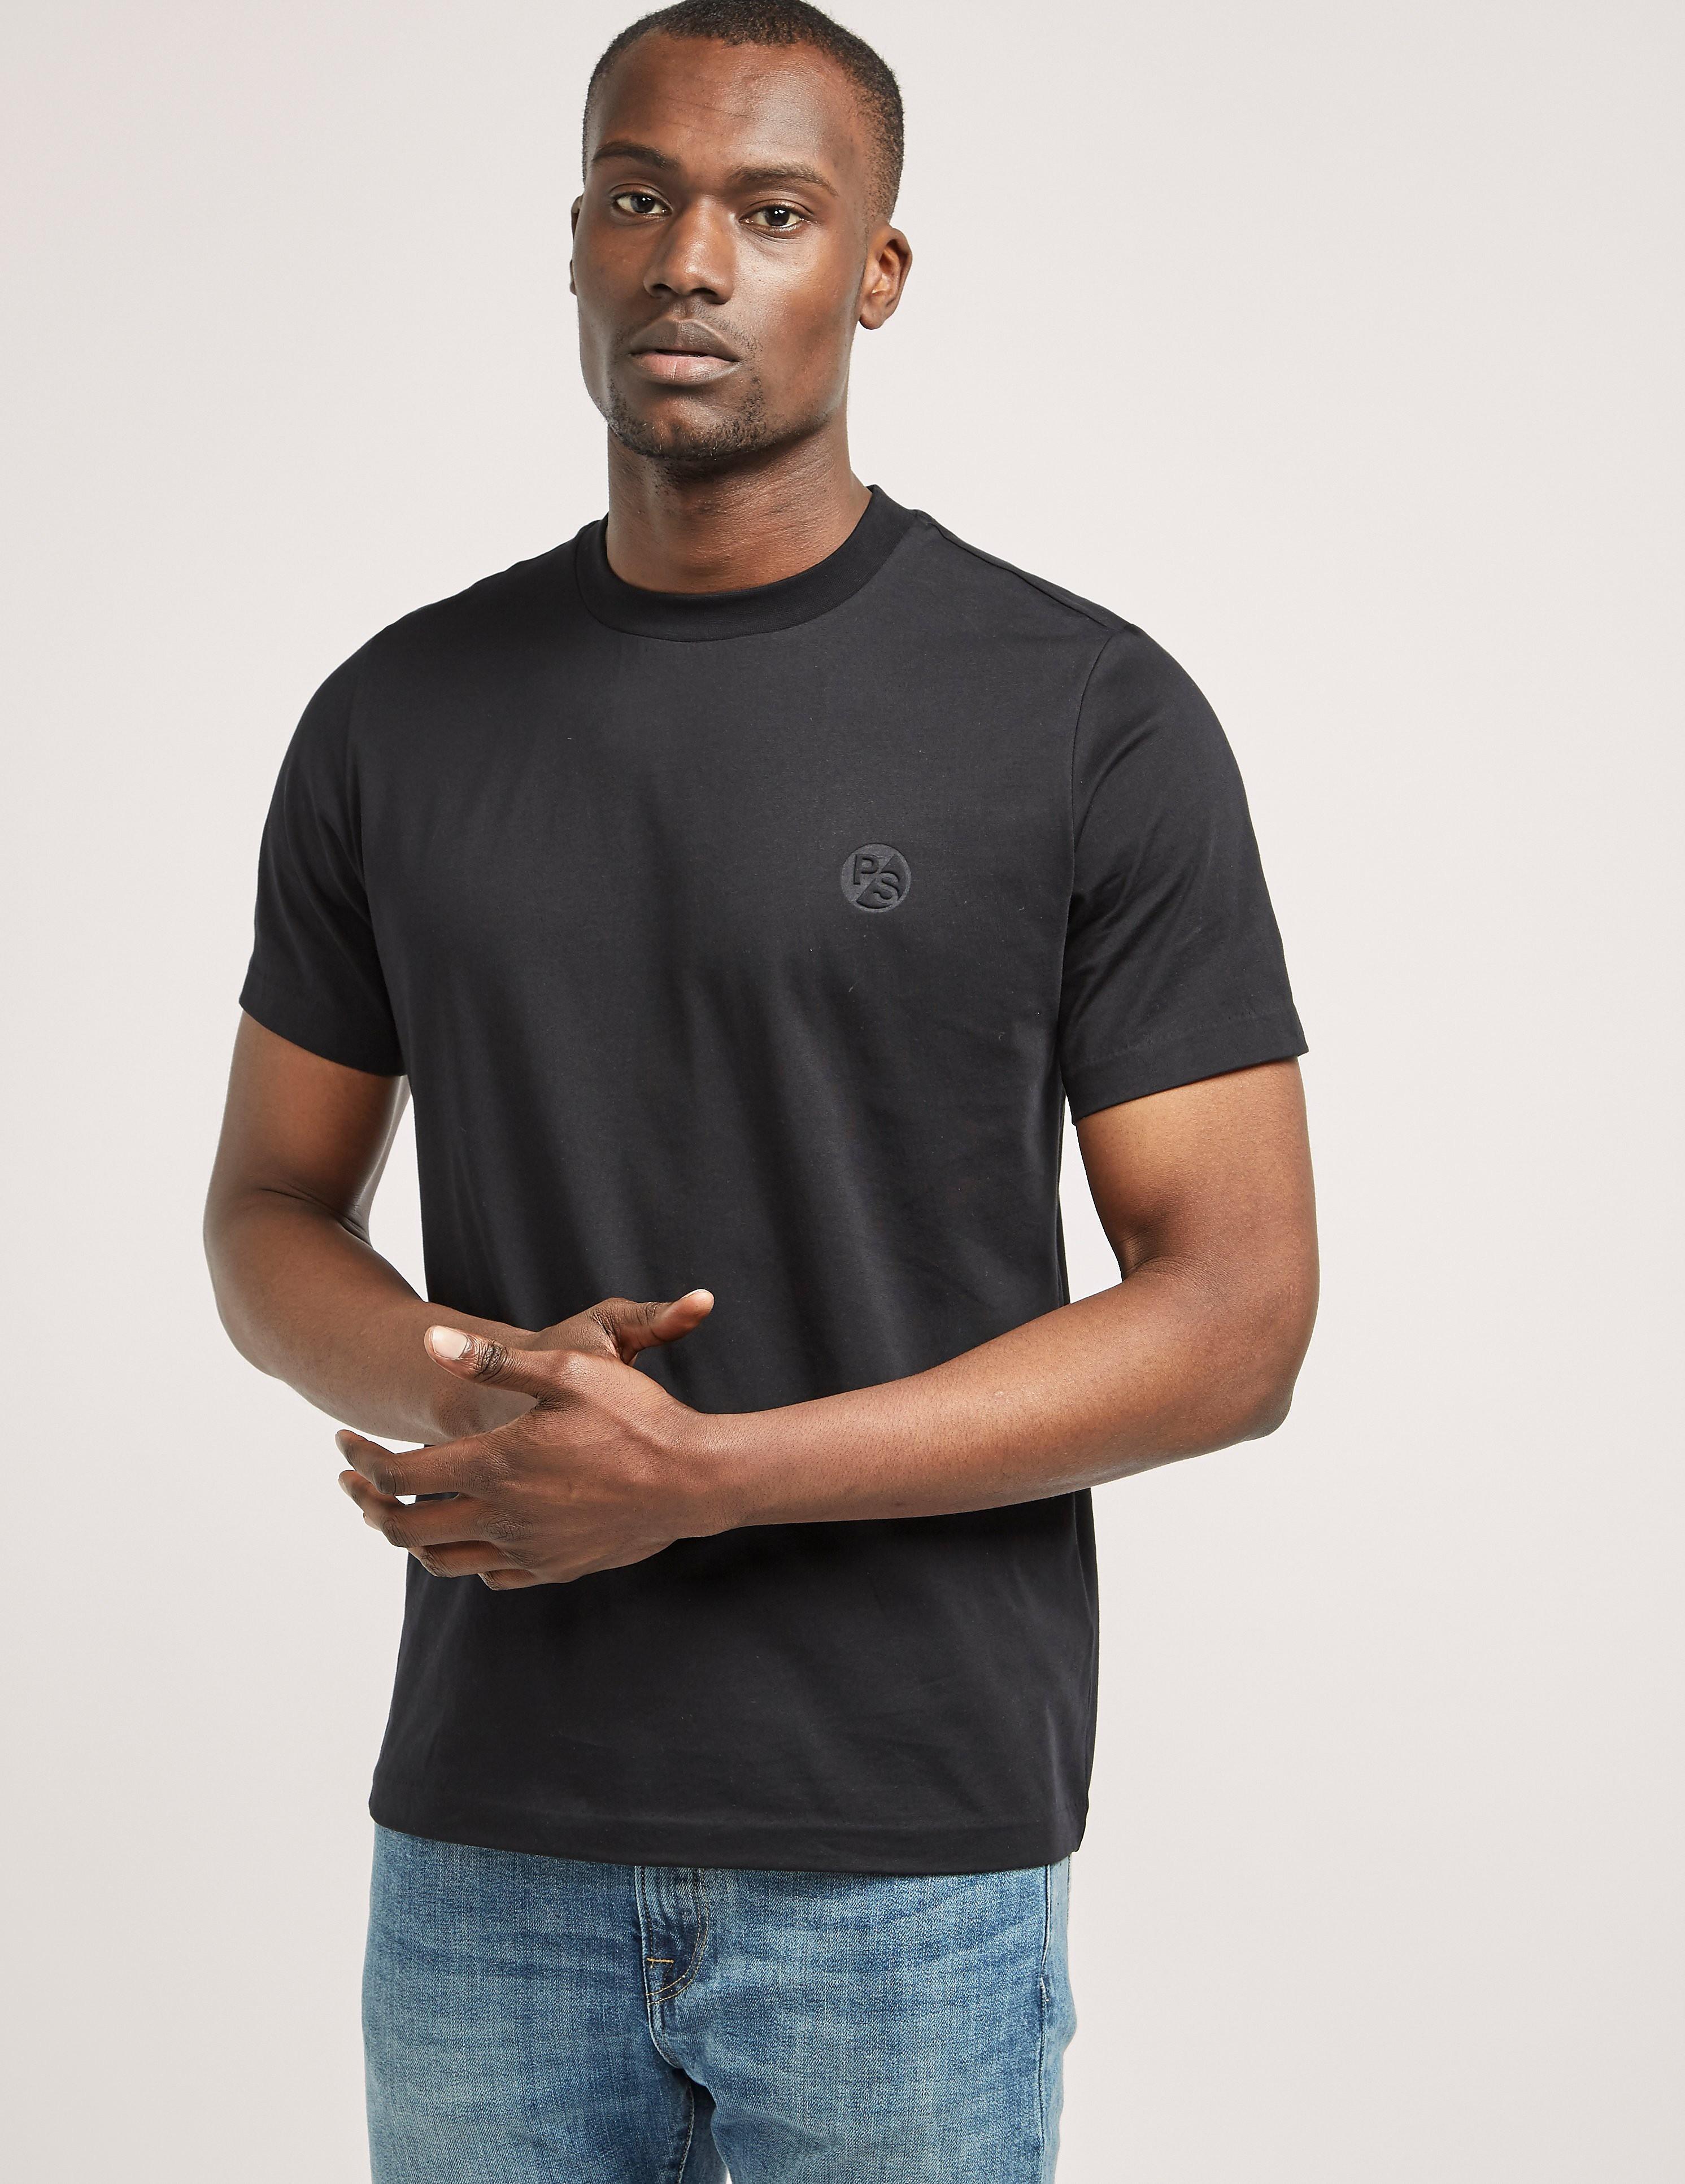 Paul Smith Embossed Logo Supima Short Sleeve T-Shirt